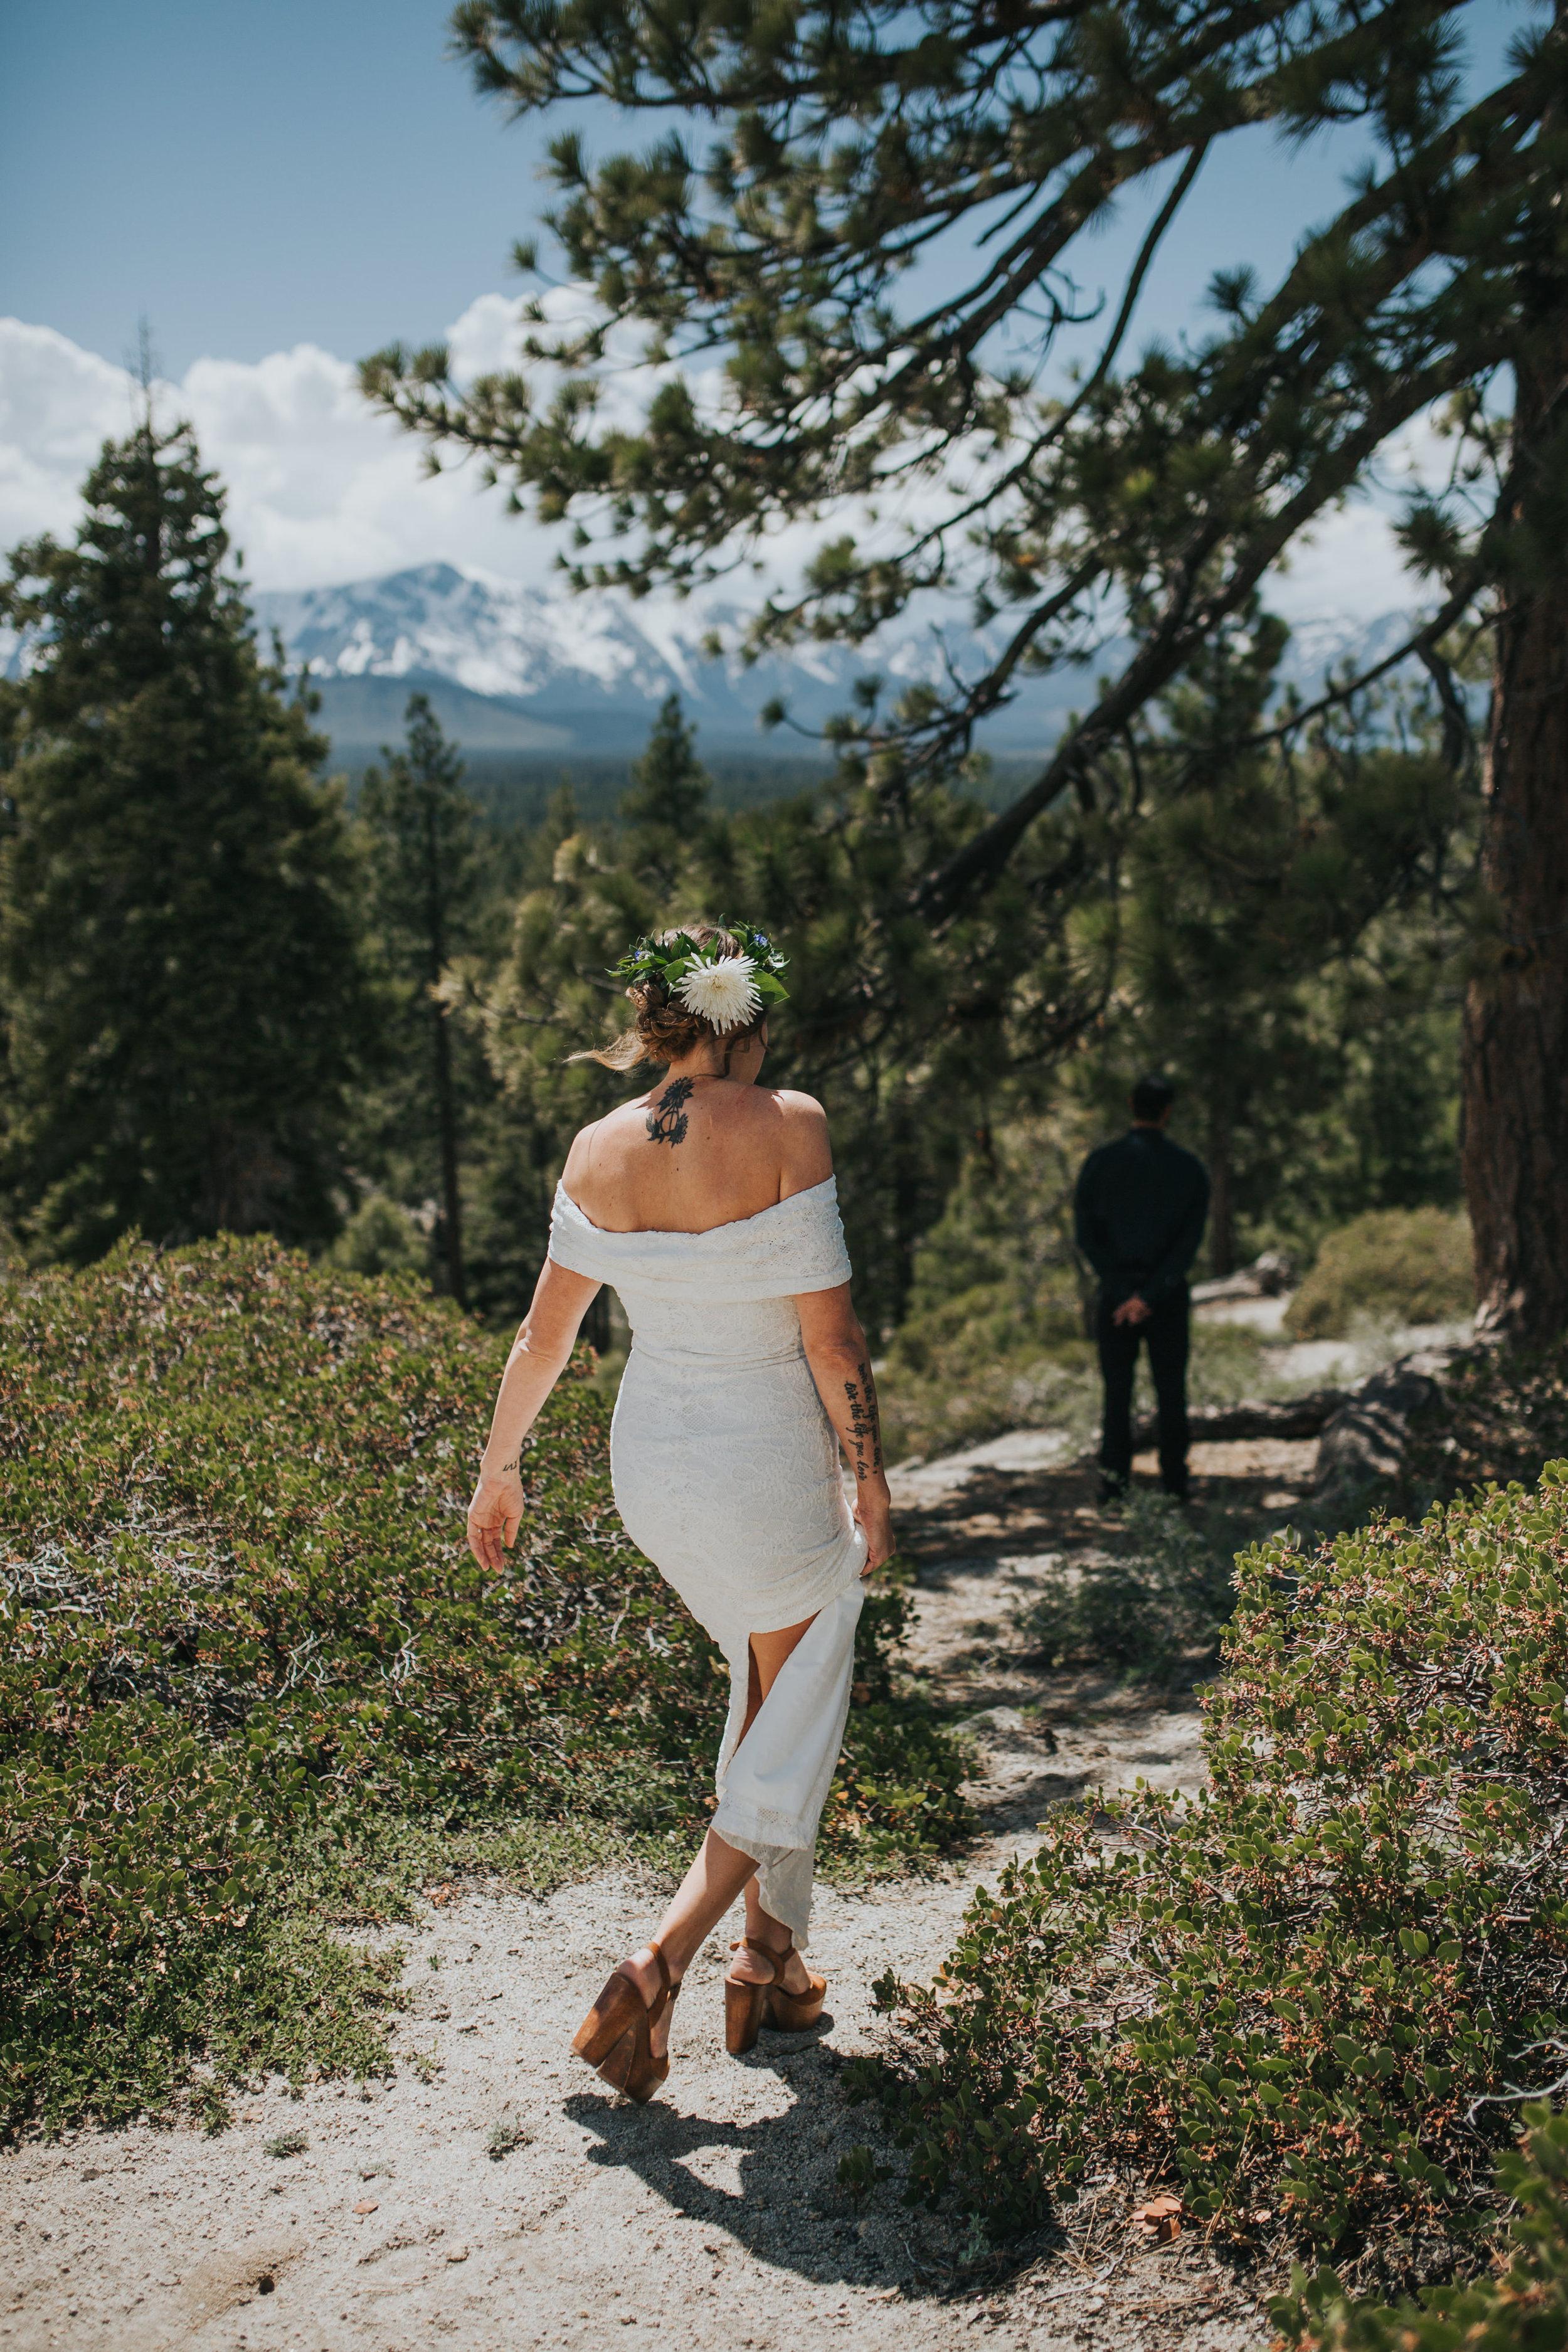 south-lake-tahoe-elopement-valerie-lendvay-photo-002.jpg